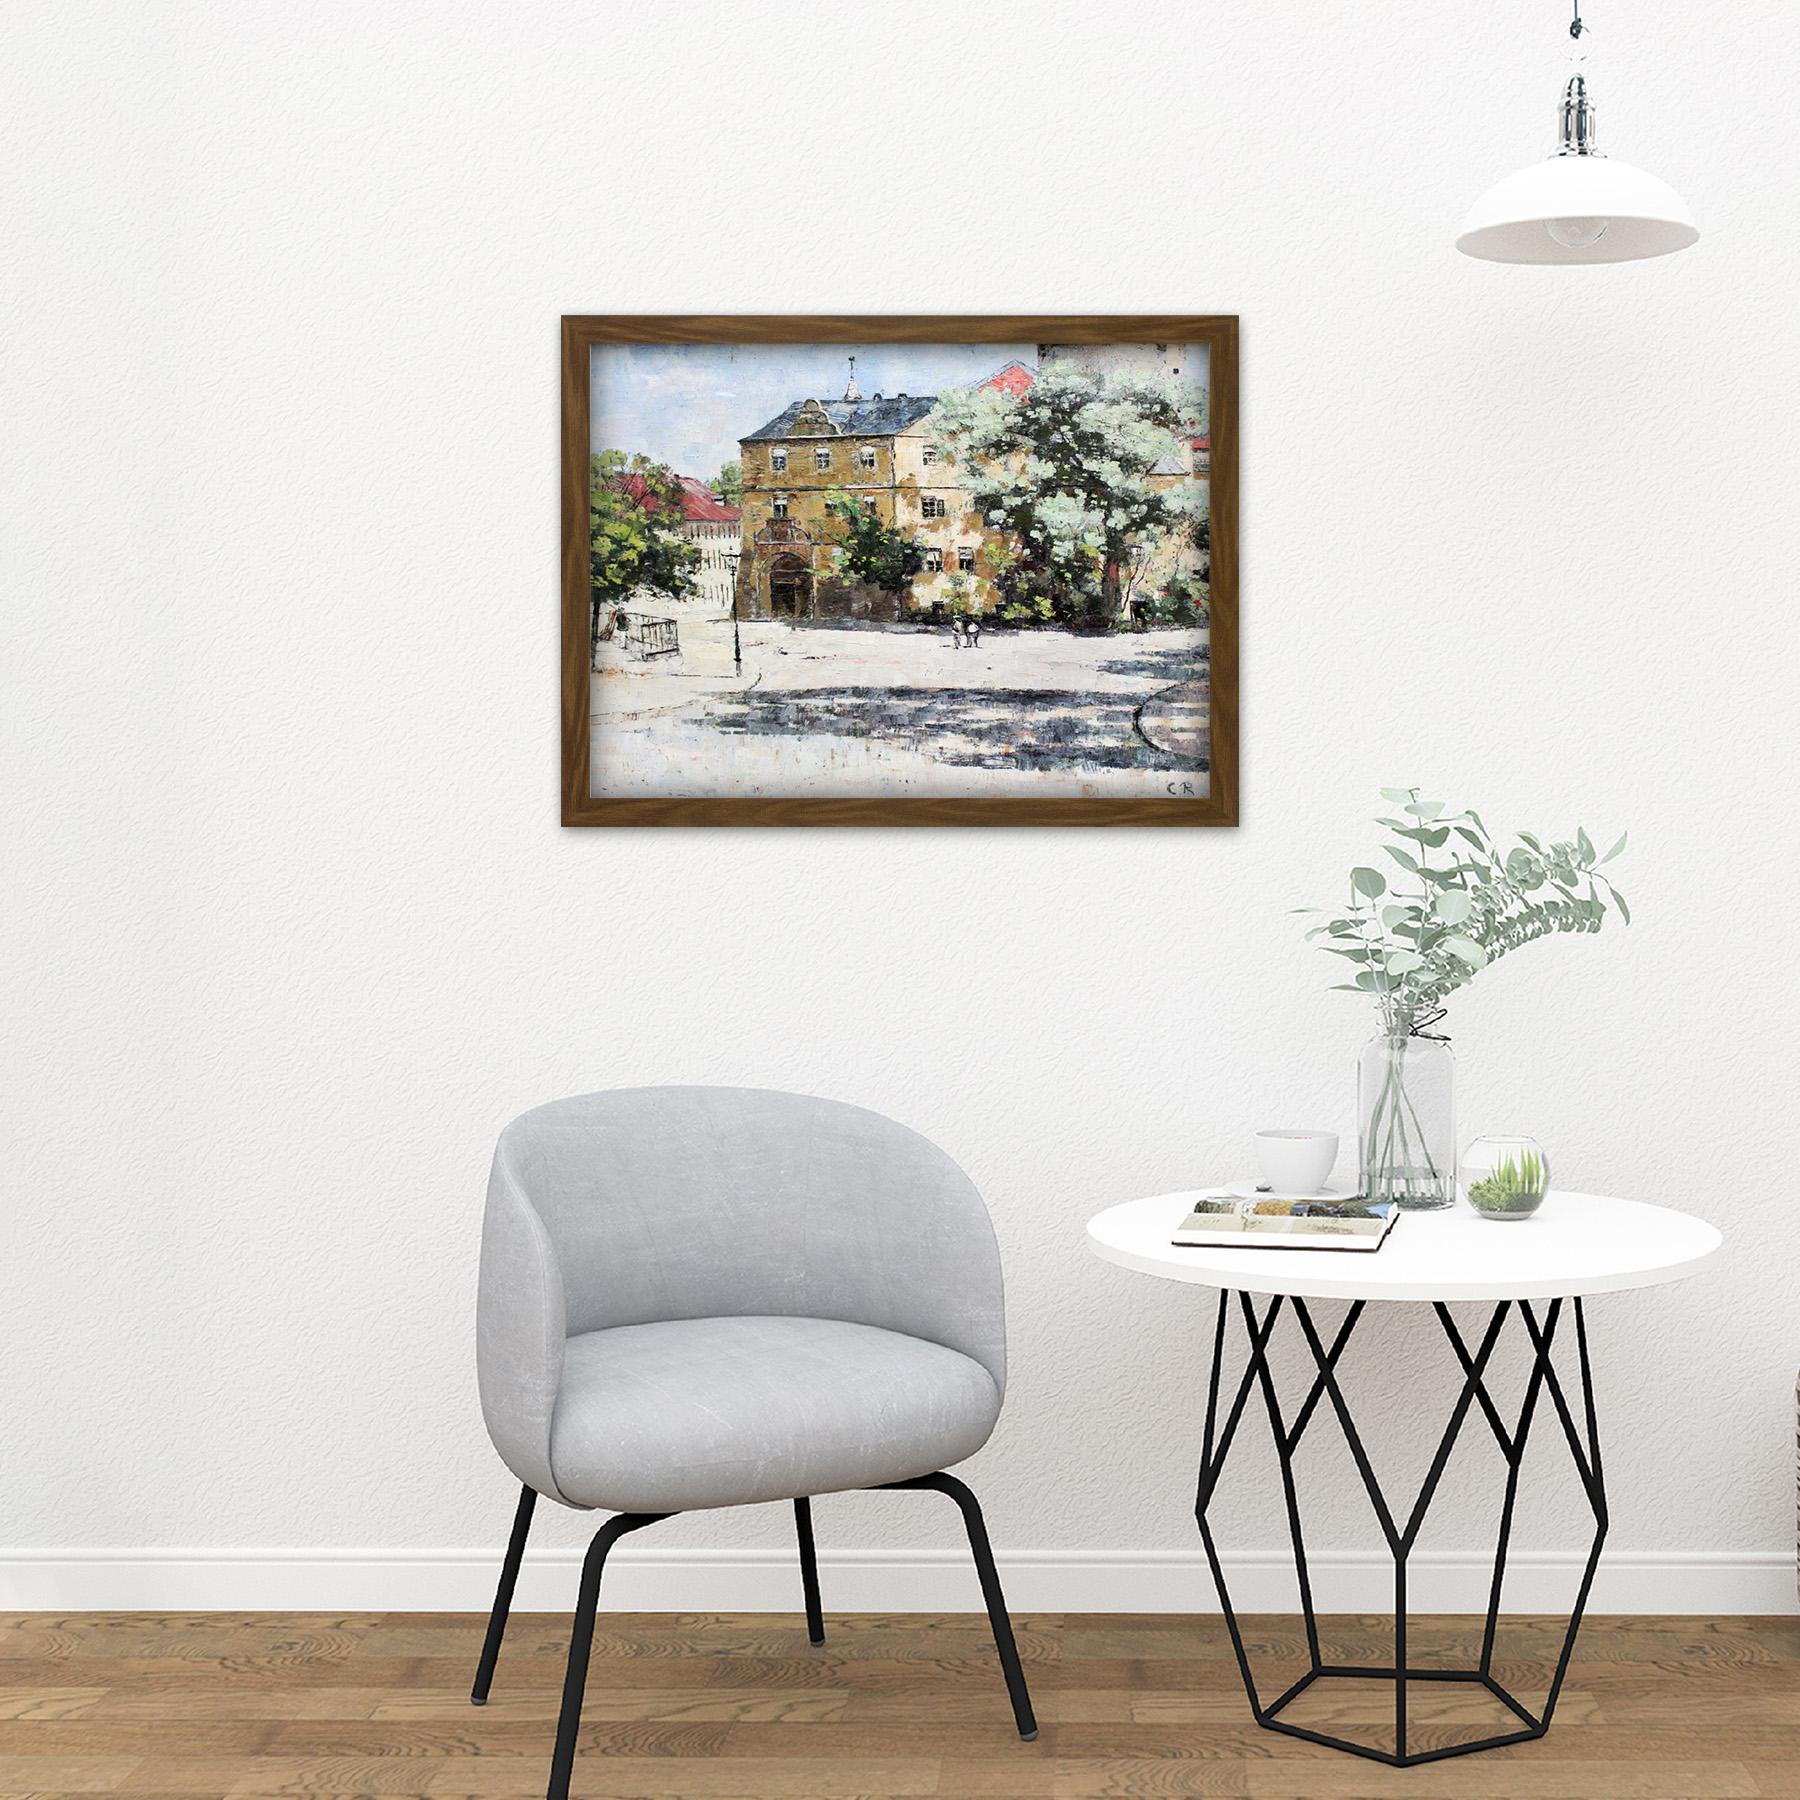 Rohlfs-Burgplatz-Weimar-Painting-Large-Framed-Art-Print thumbnail 13